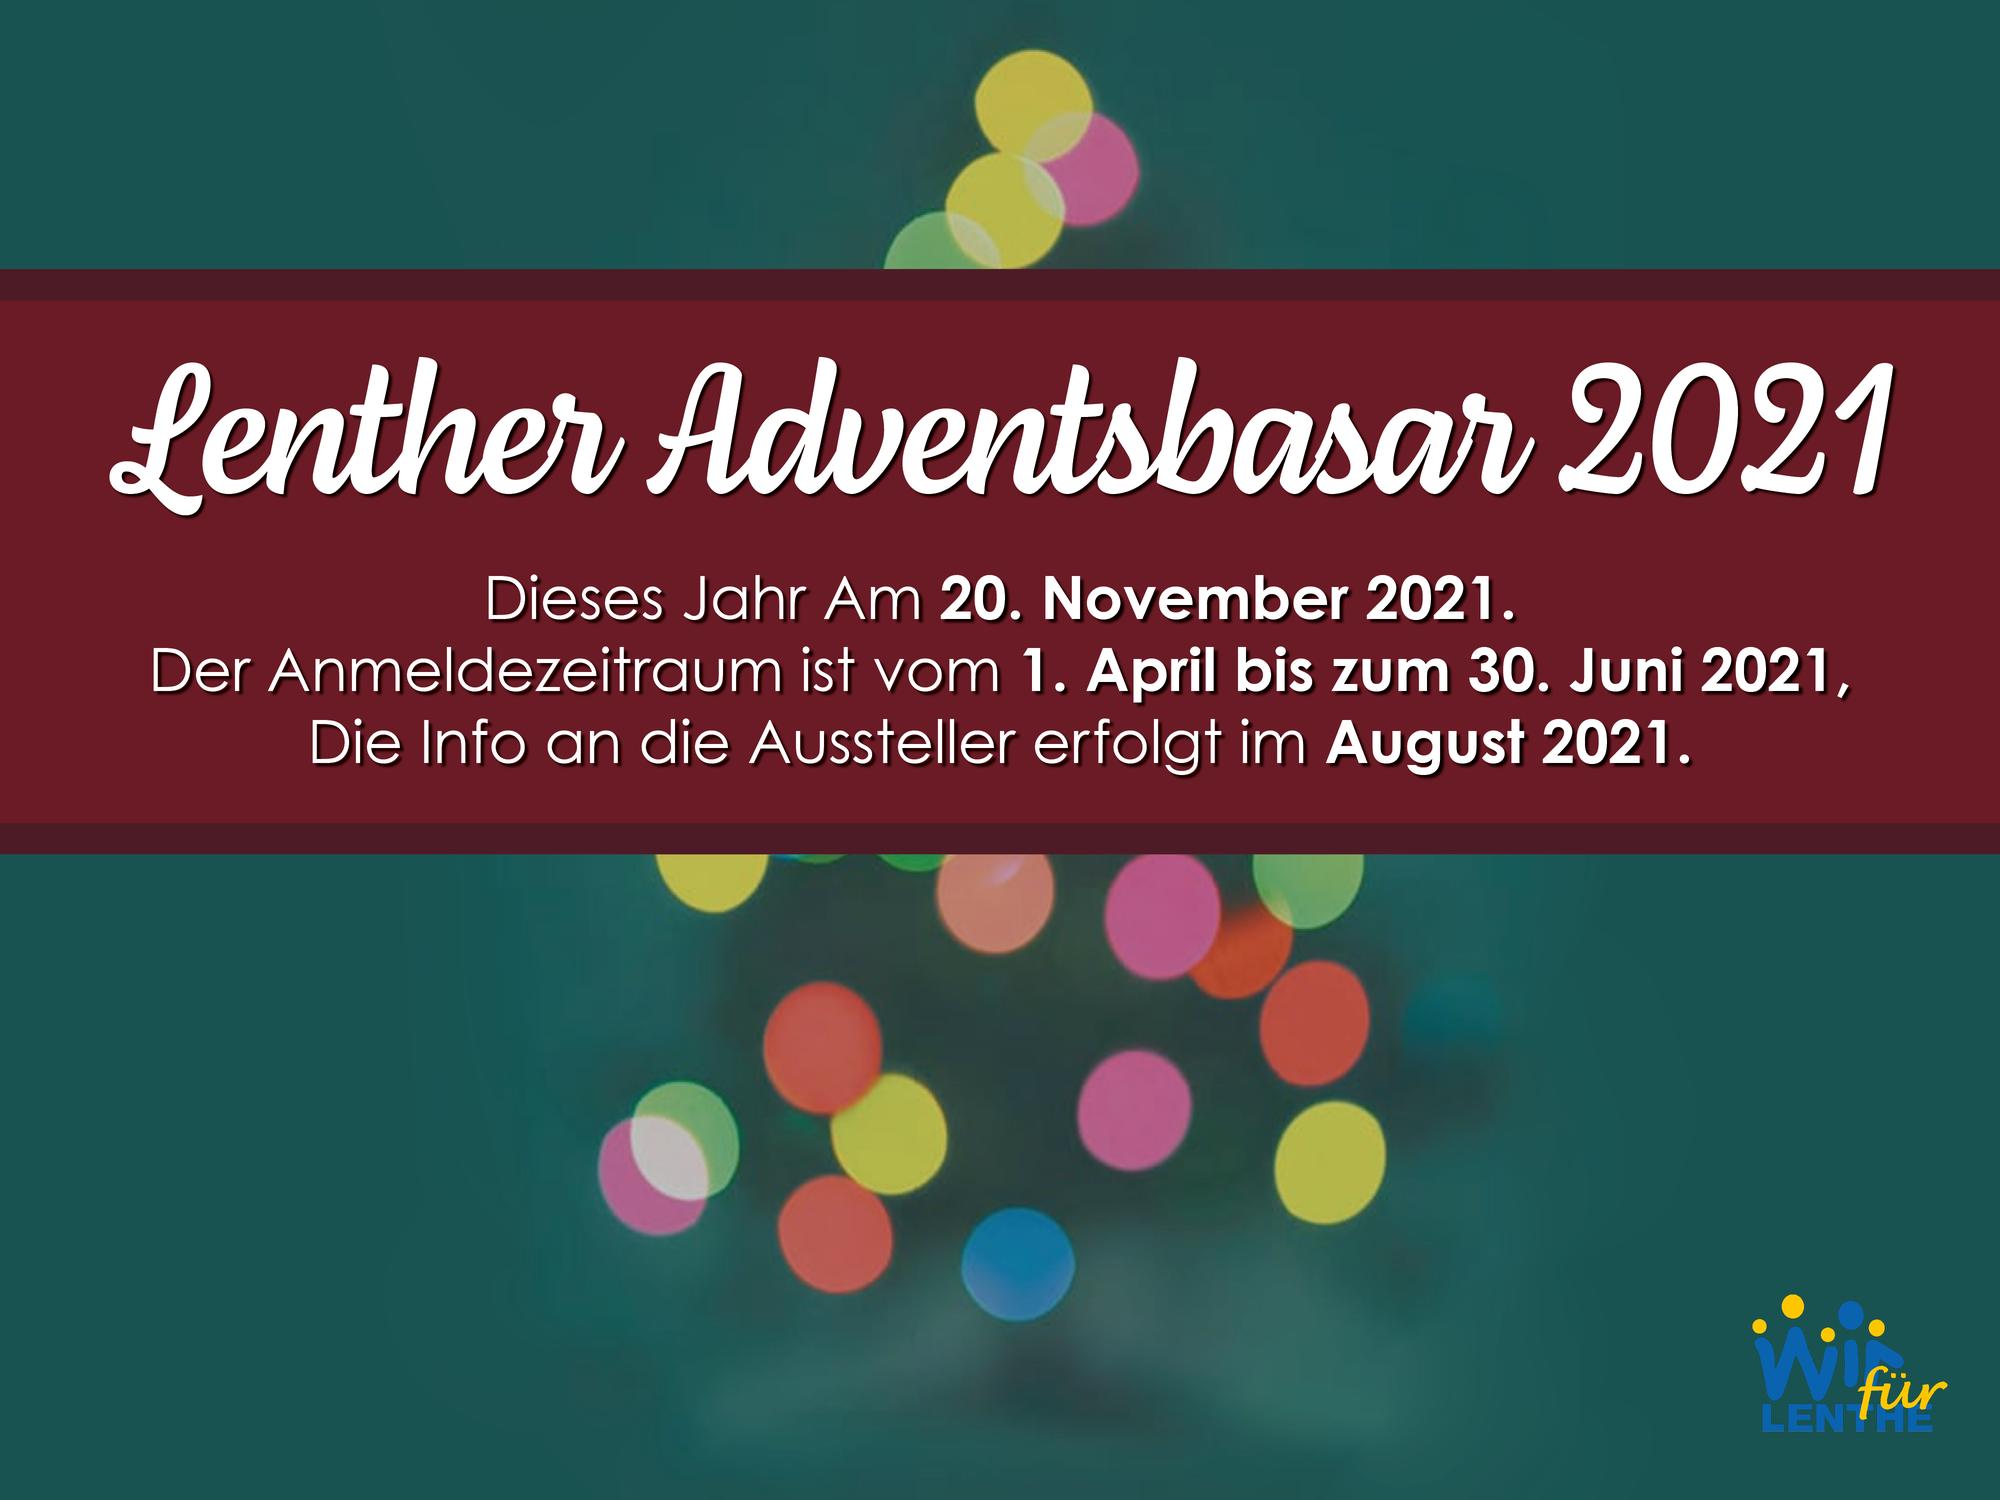 Lenther Adventsbasar 2021